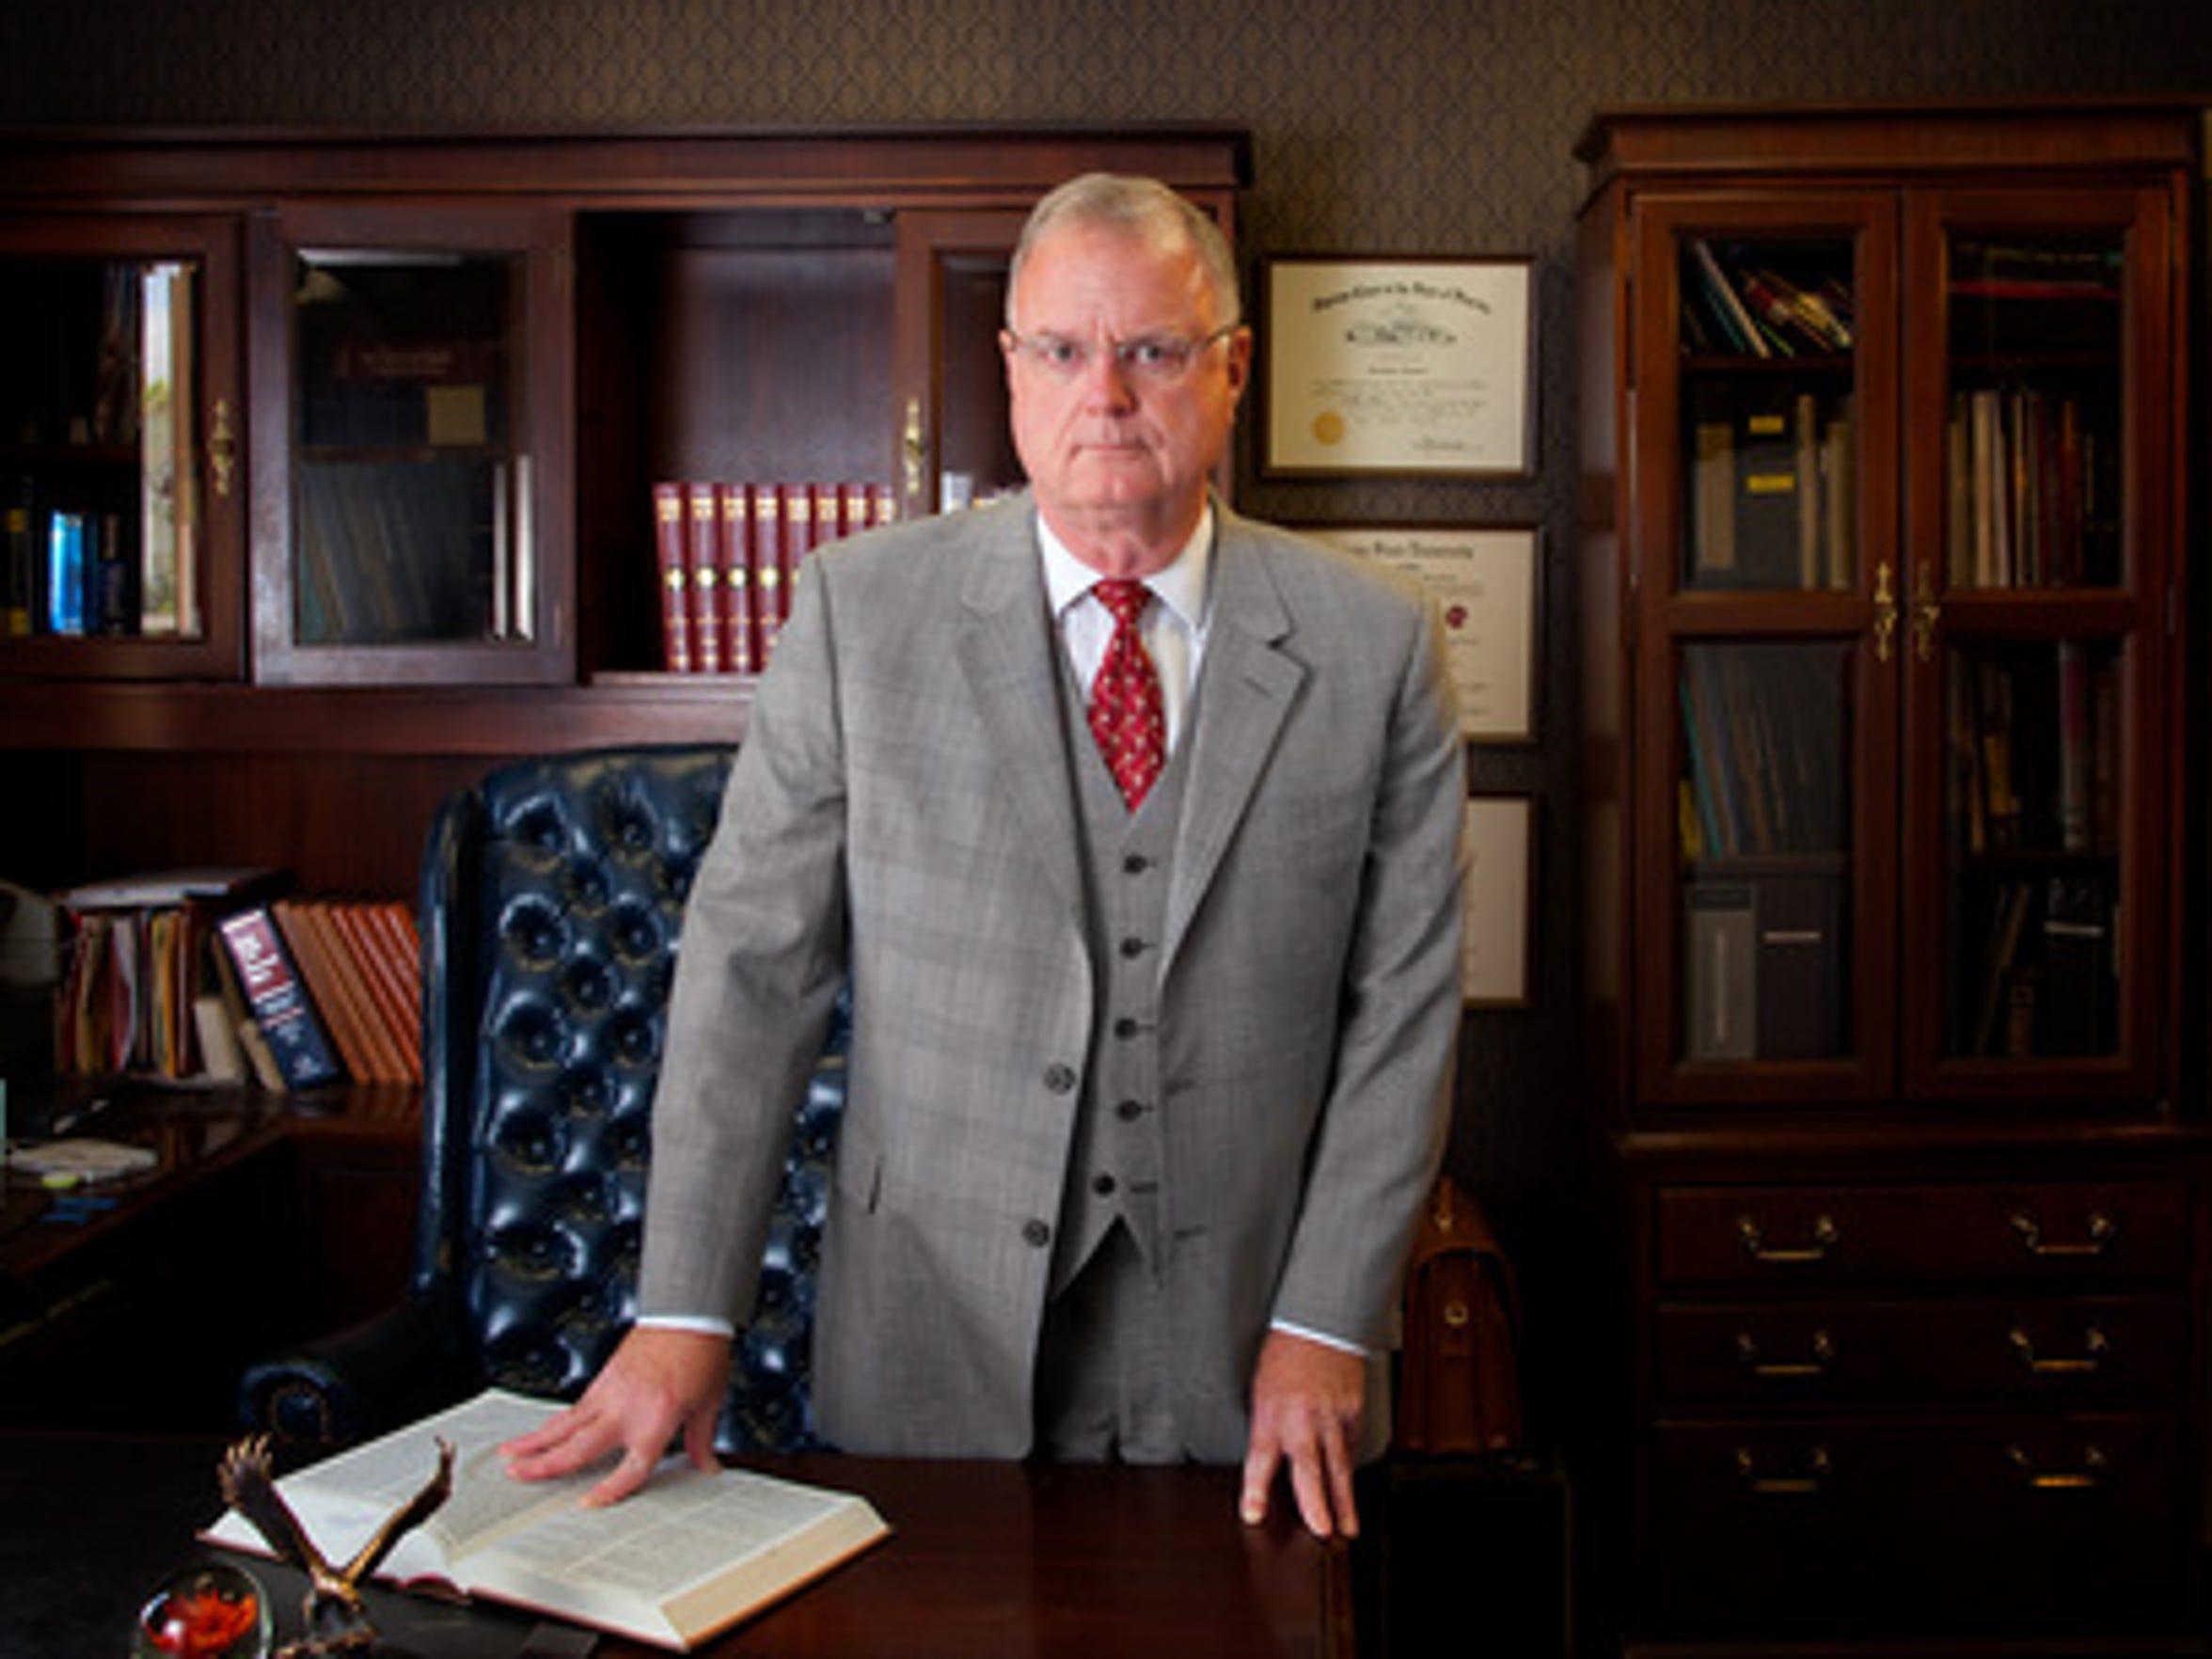 Criminal defense attorney Sam Bardwell quit the prosecutor's